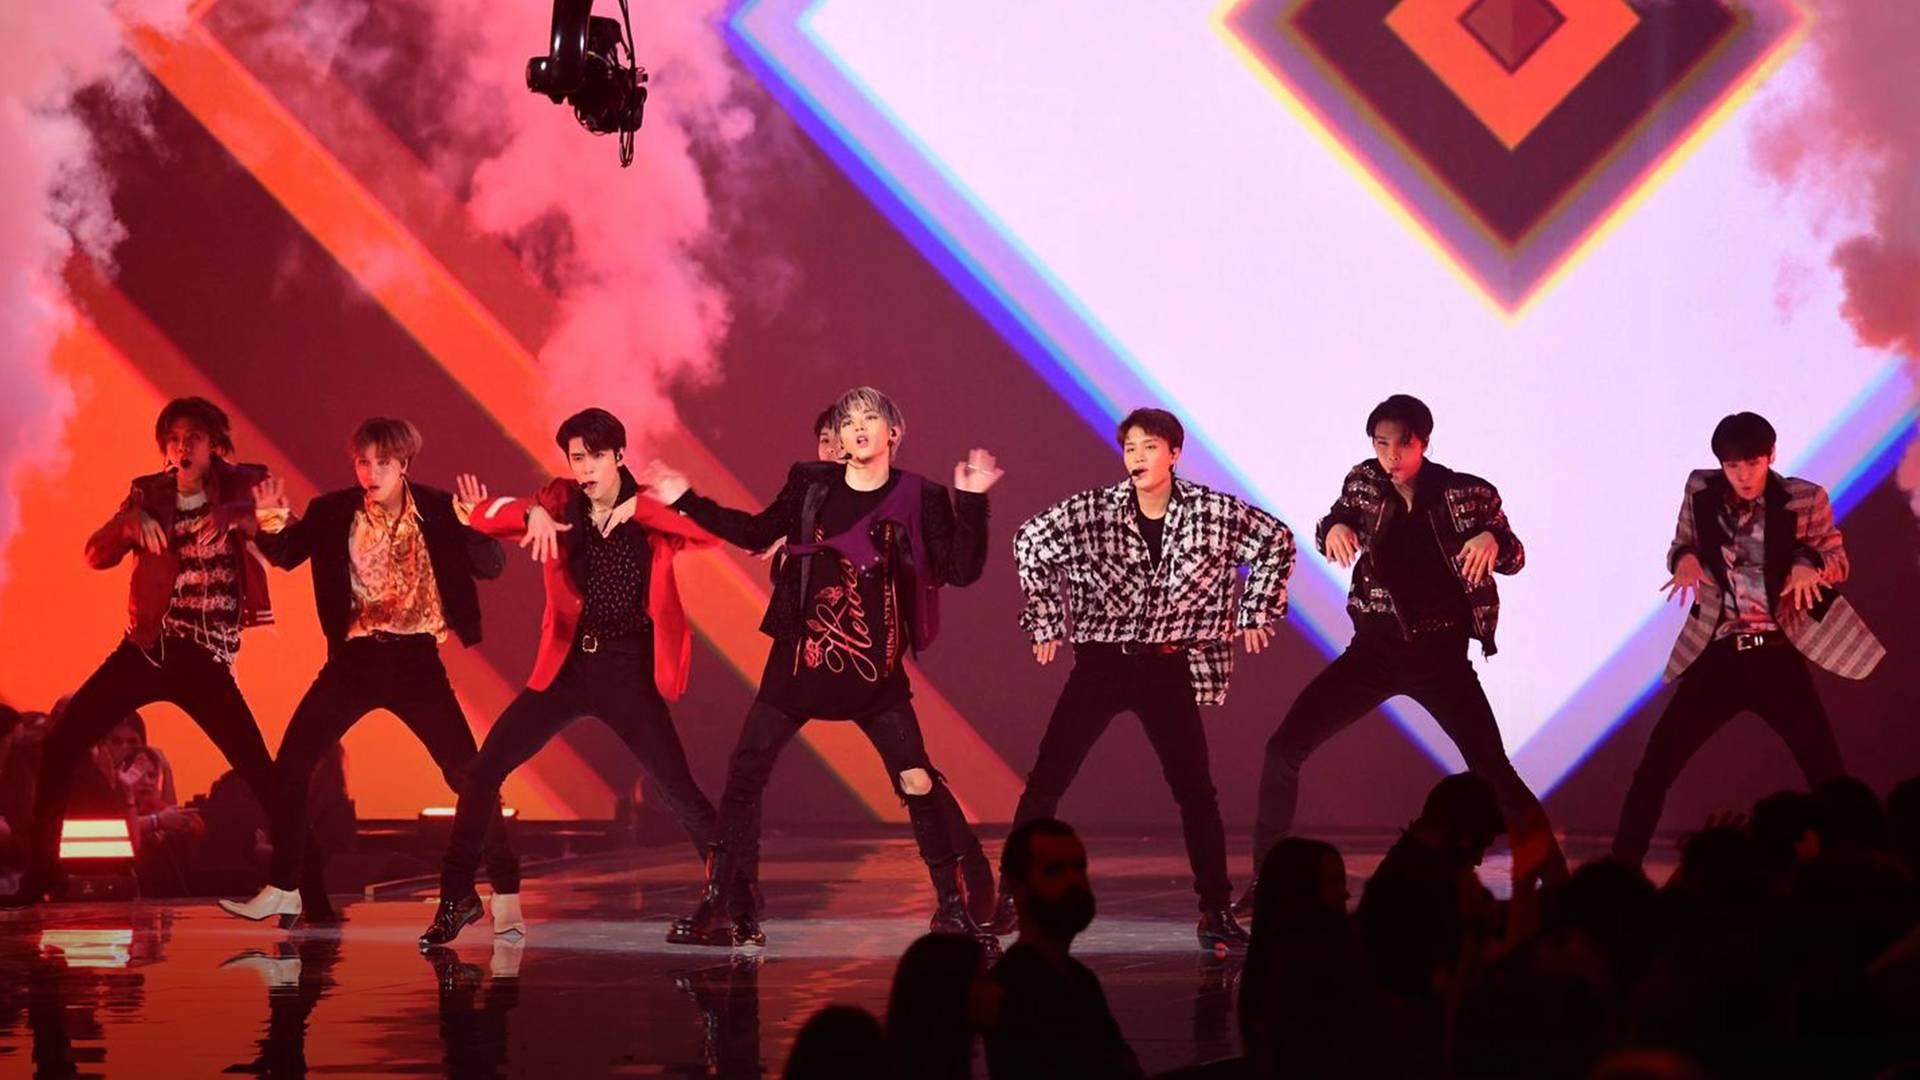 MTV 2019 EMAs   NCT 127 Performance   16:9   1920x1080   11/03/19.jpg